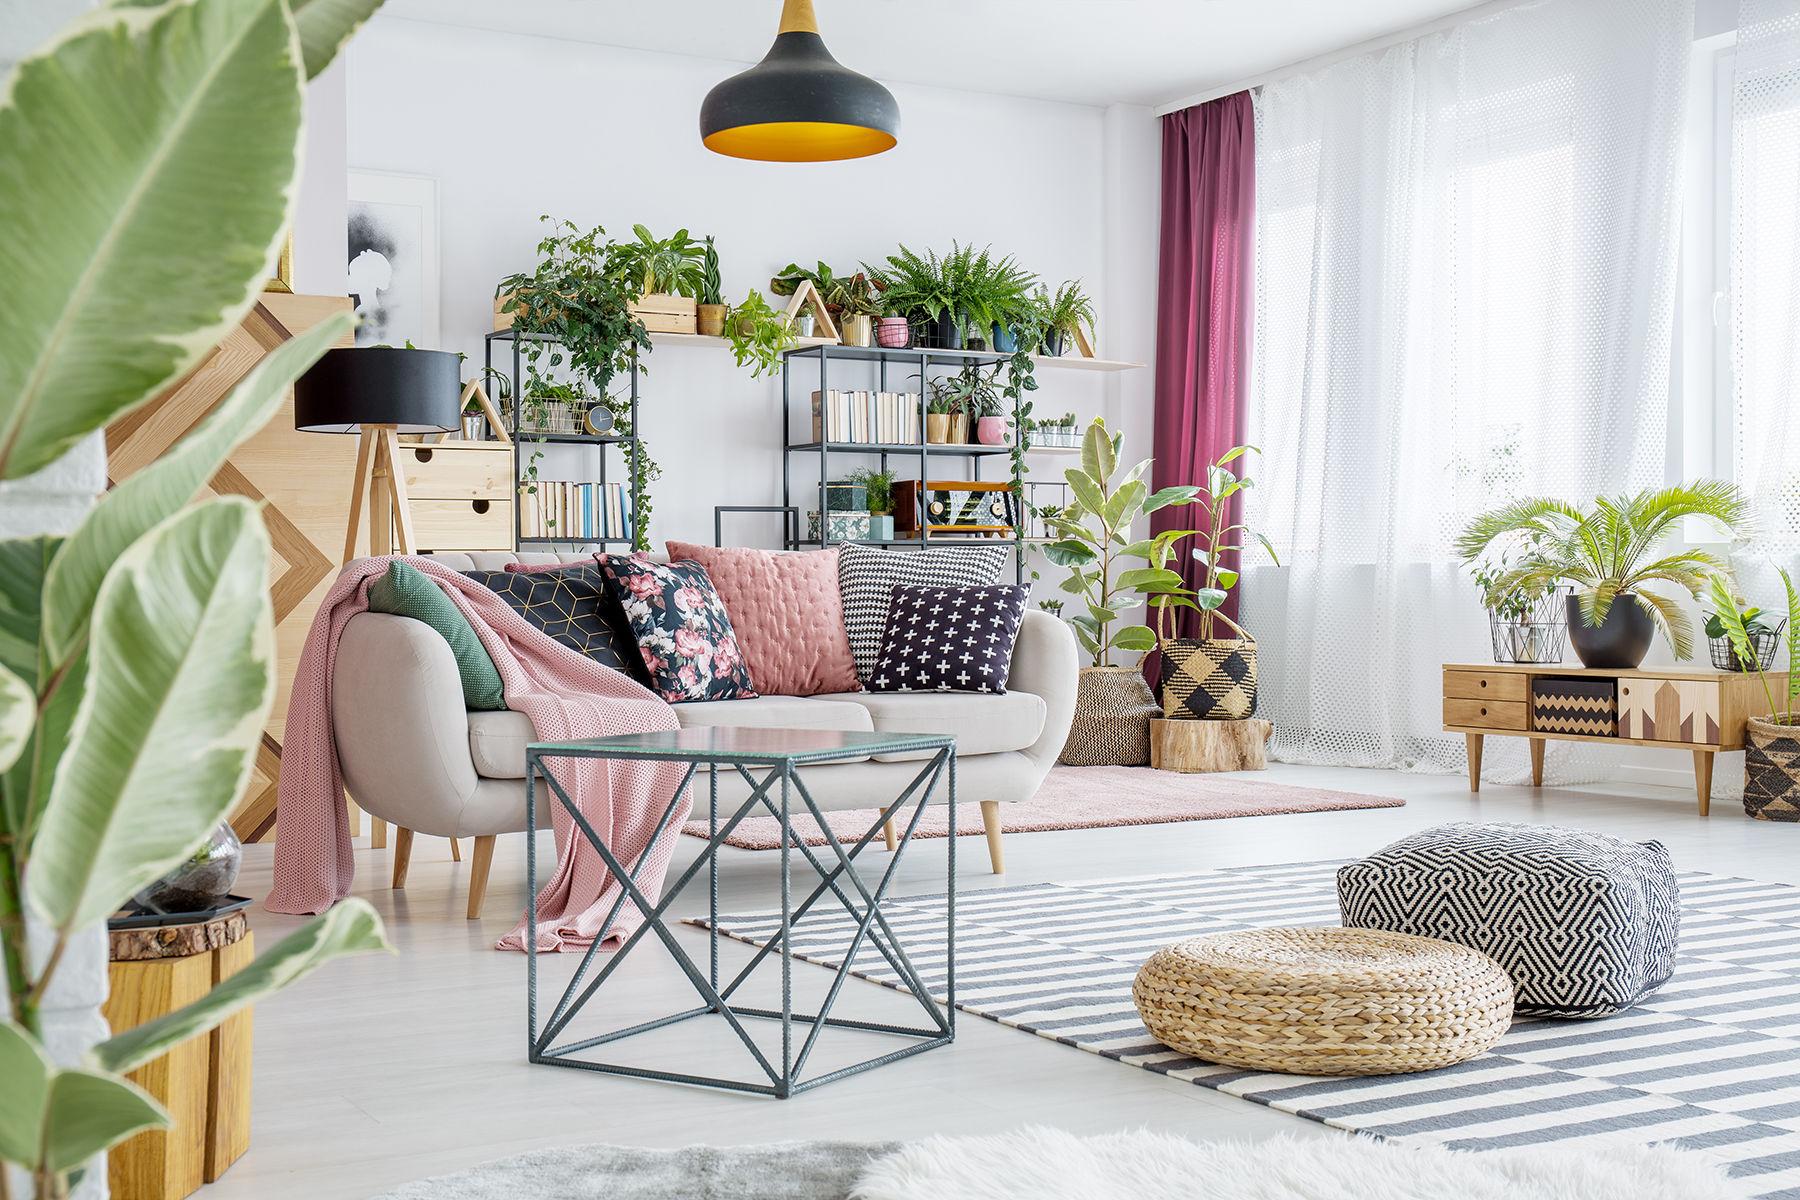 Full Size of Sofa Alternatives Ikea Couch Cheap Togo Uk Reddit To Sleeper Sofas Crossword Best Bed For Small Spaces Living Room Alternative 2020 Gnstige Mbel Kaufen Glamour Sofa Sofa Alternatives